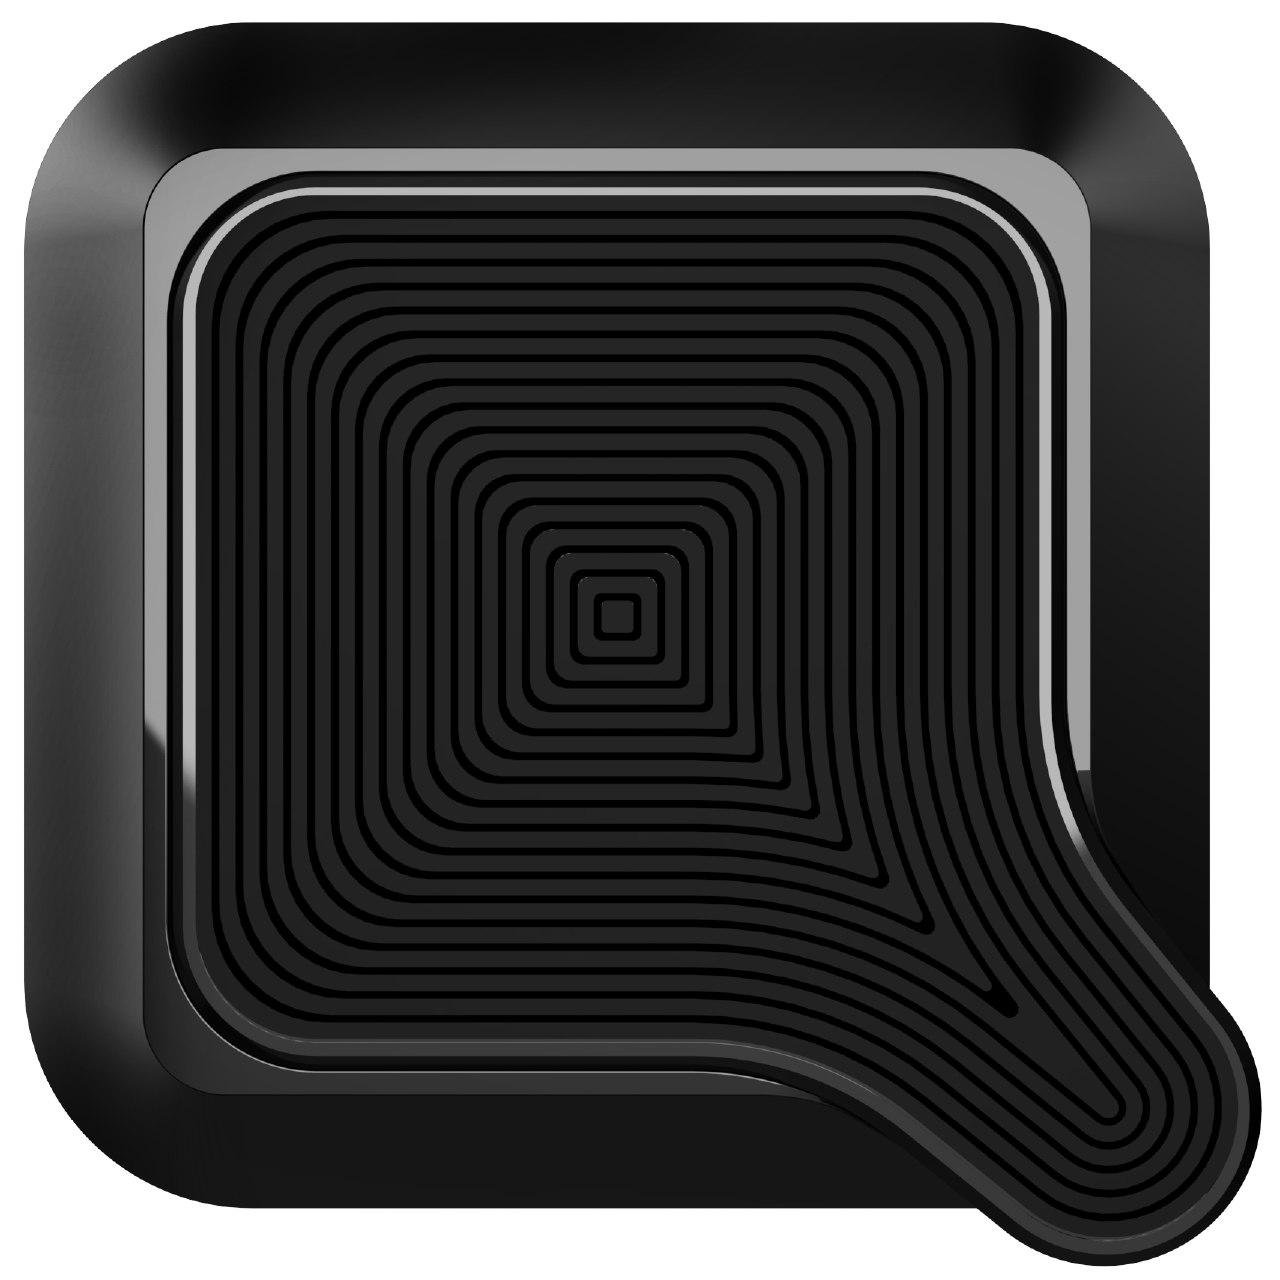 QLYX Universal Air Vent Magnetic Smart Car Phone Mount Holder Adhesive Phone Cradle Black